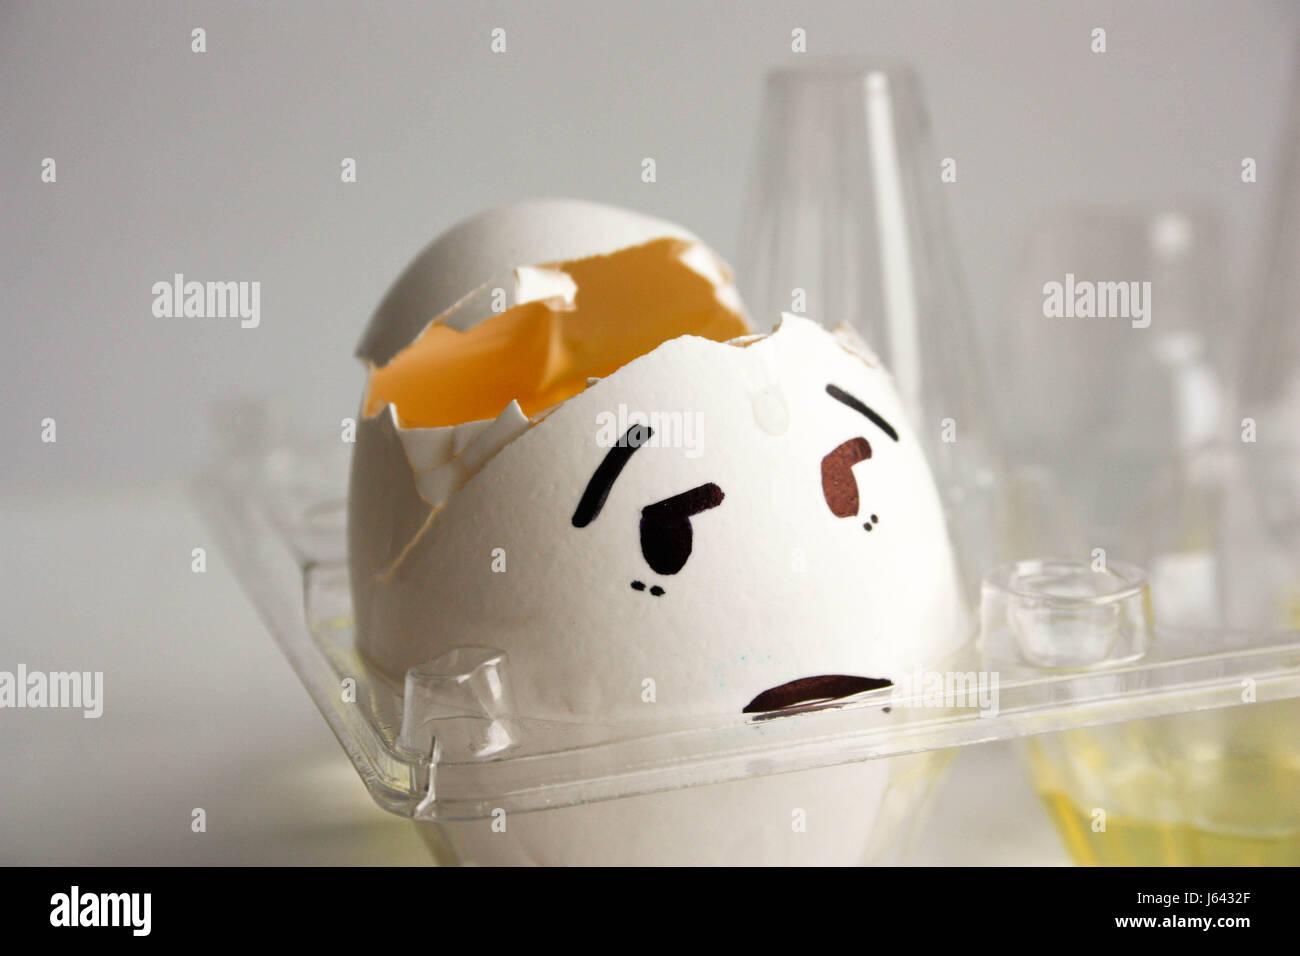 An egg with a face. Concept of headache. hangover. Photo for your design Stock Photo